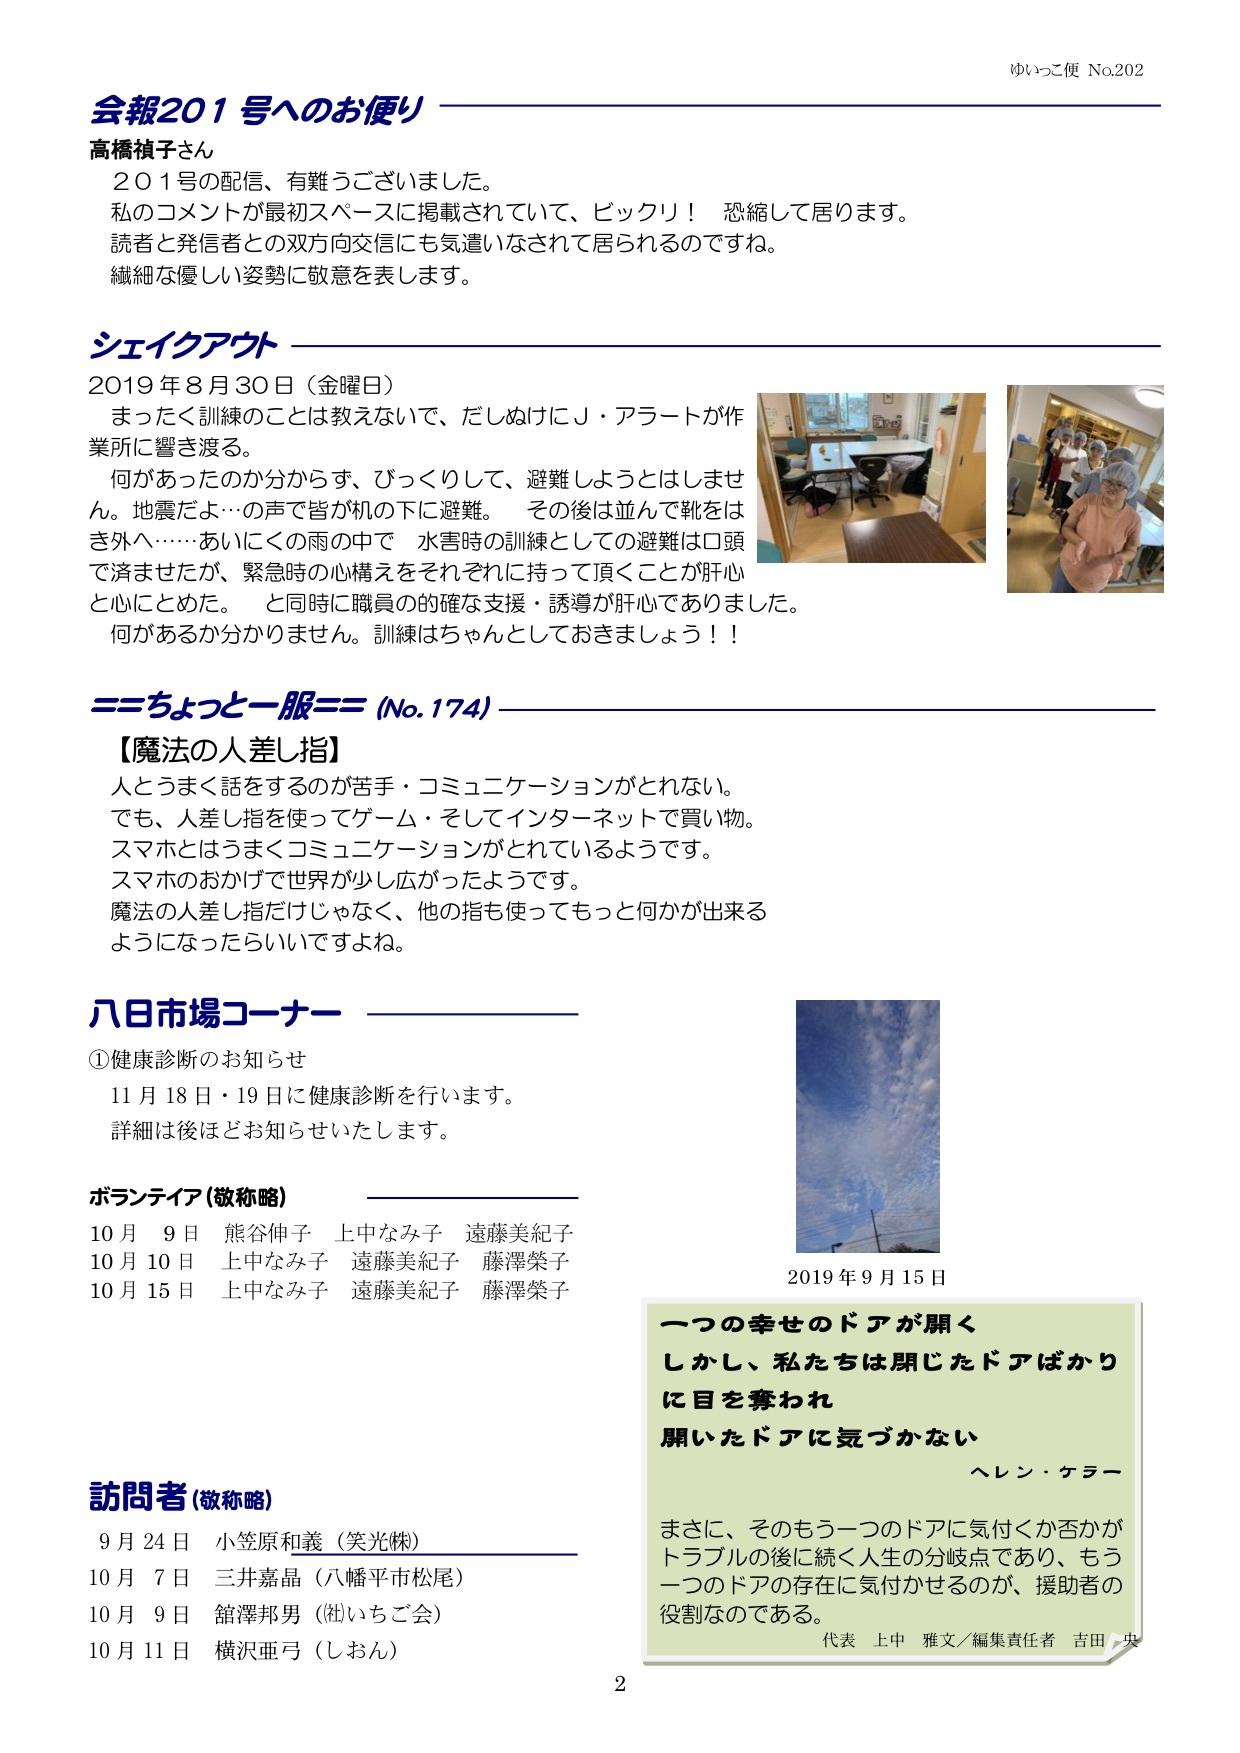 「You-Meゆいっこ便」No.202(2019.10.15)_a0103650_21005045.jpg